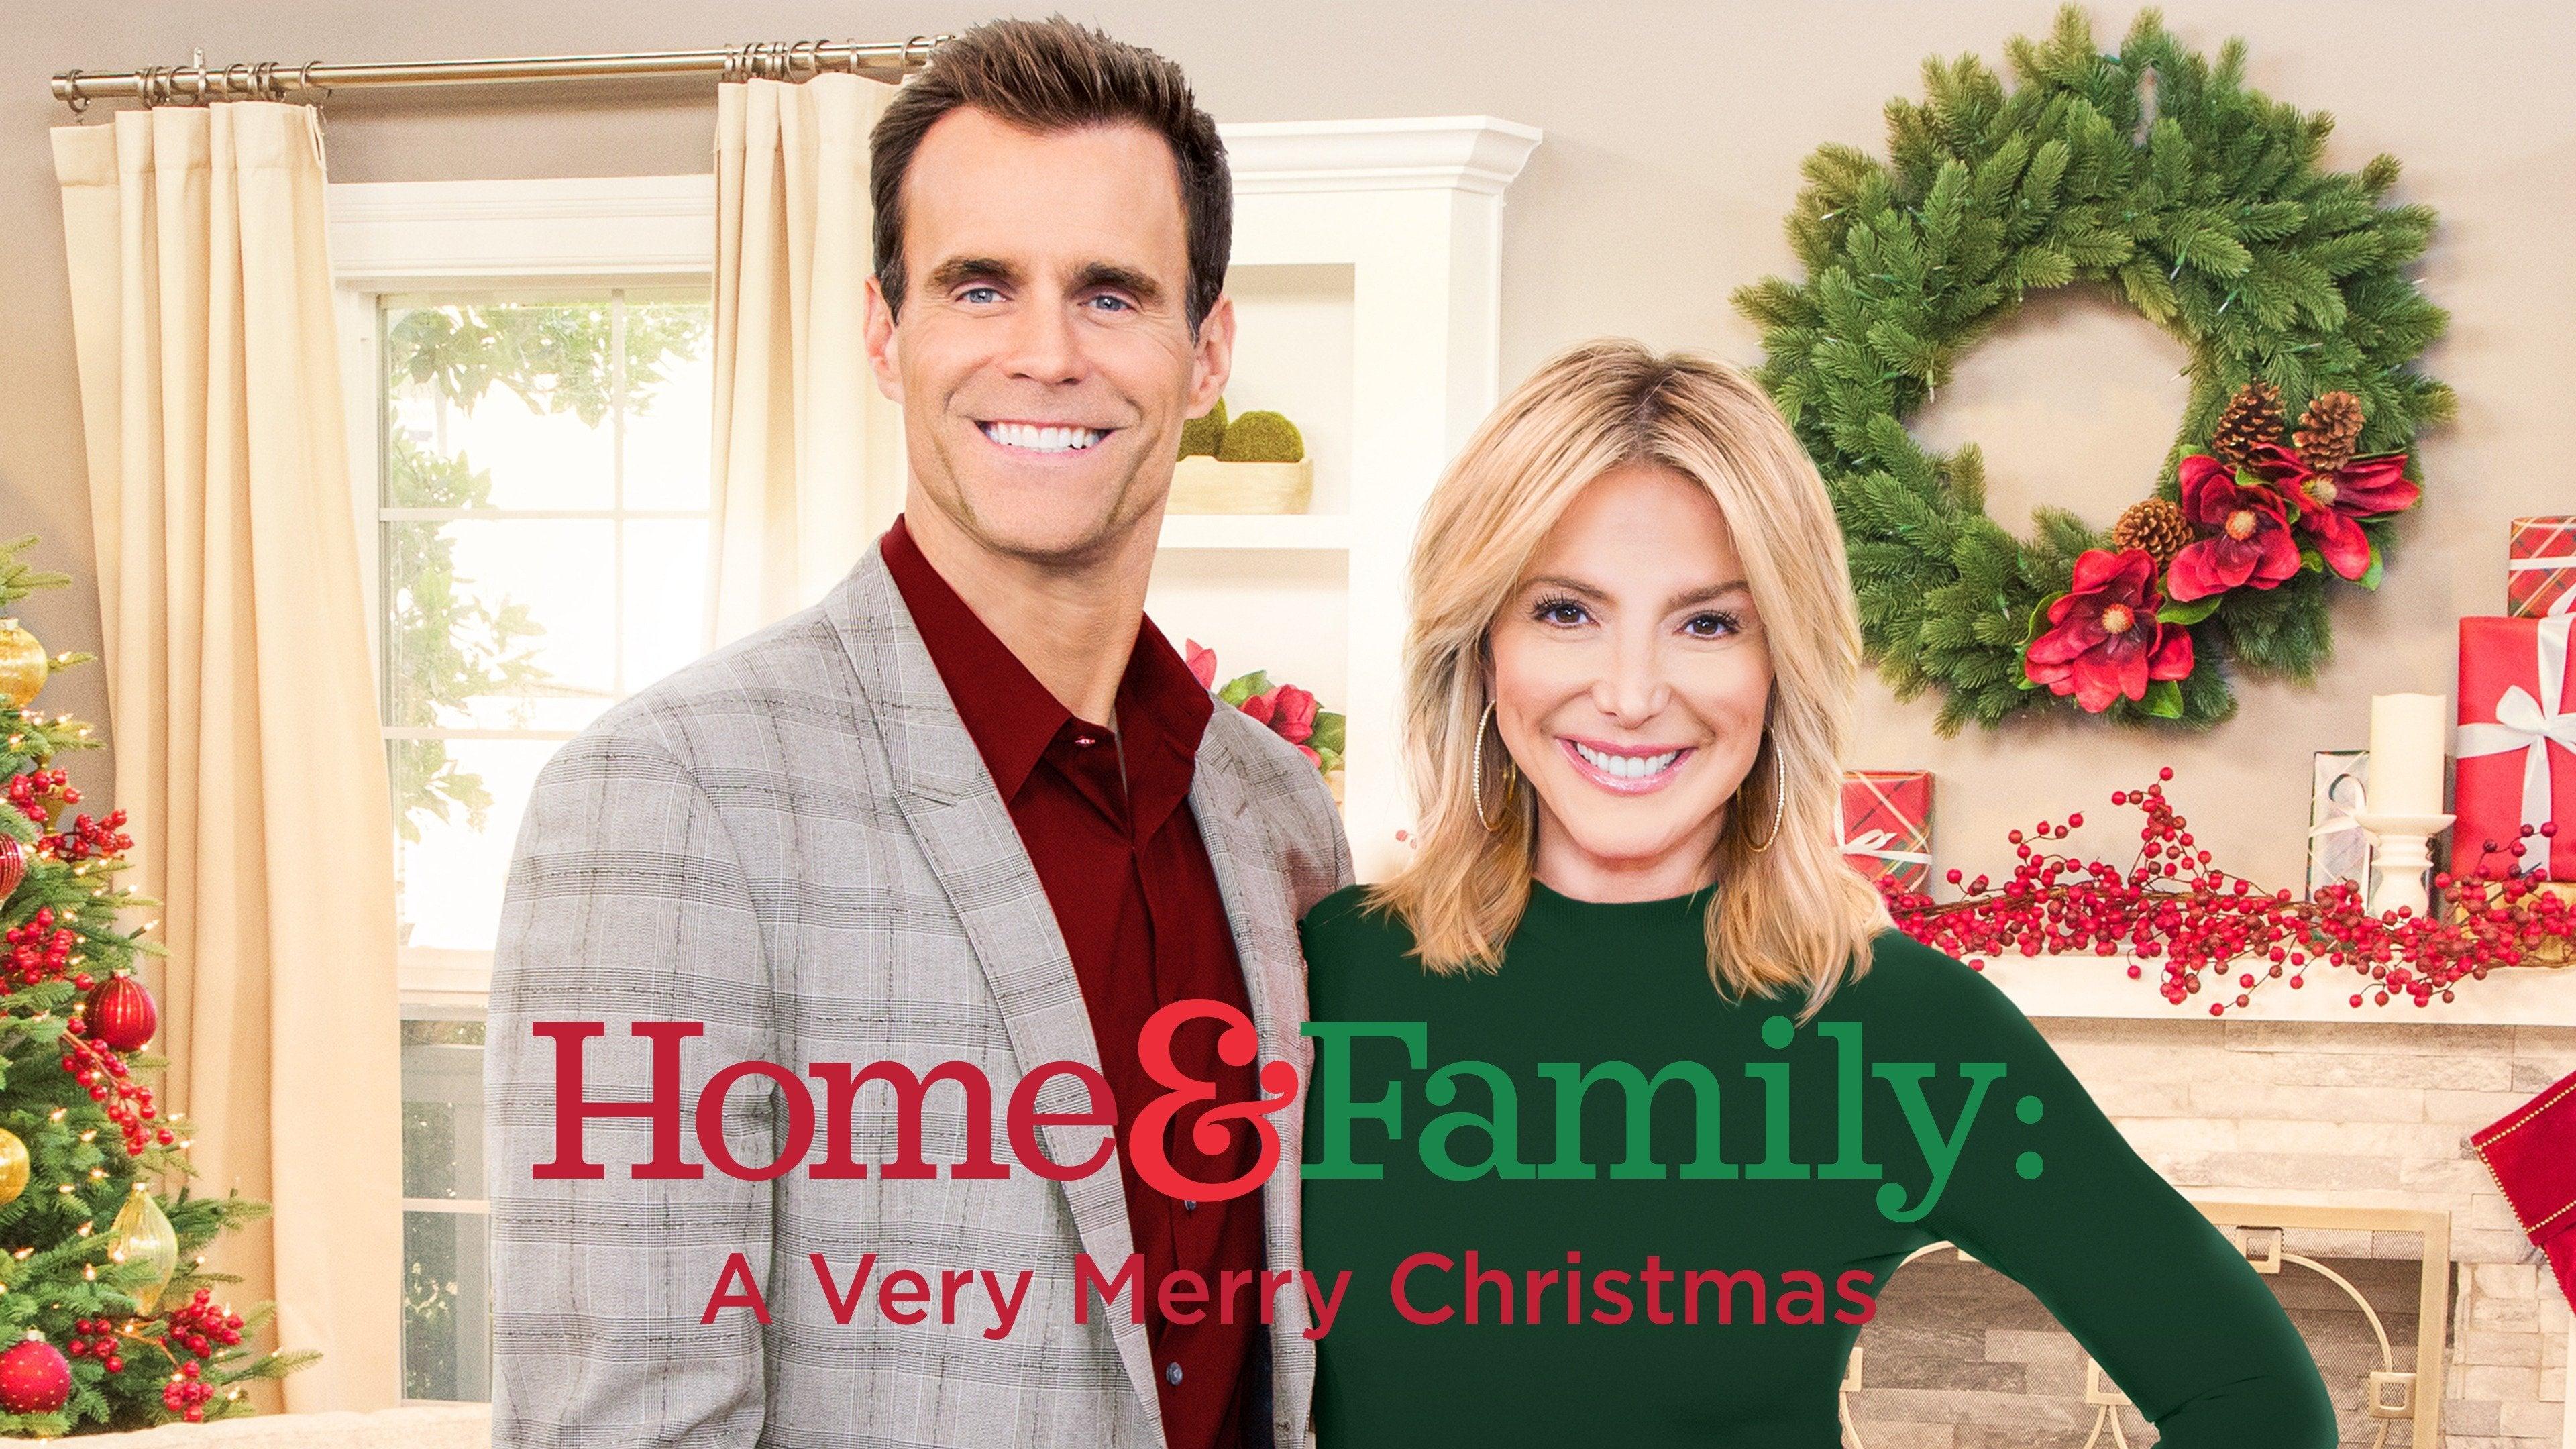 Home & Family: A Very Merry Christmas